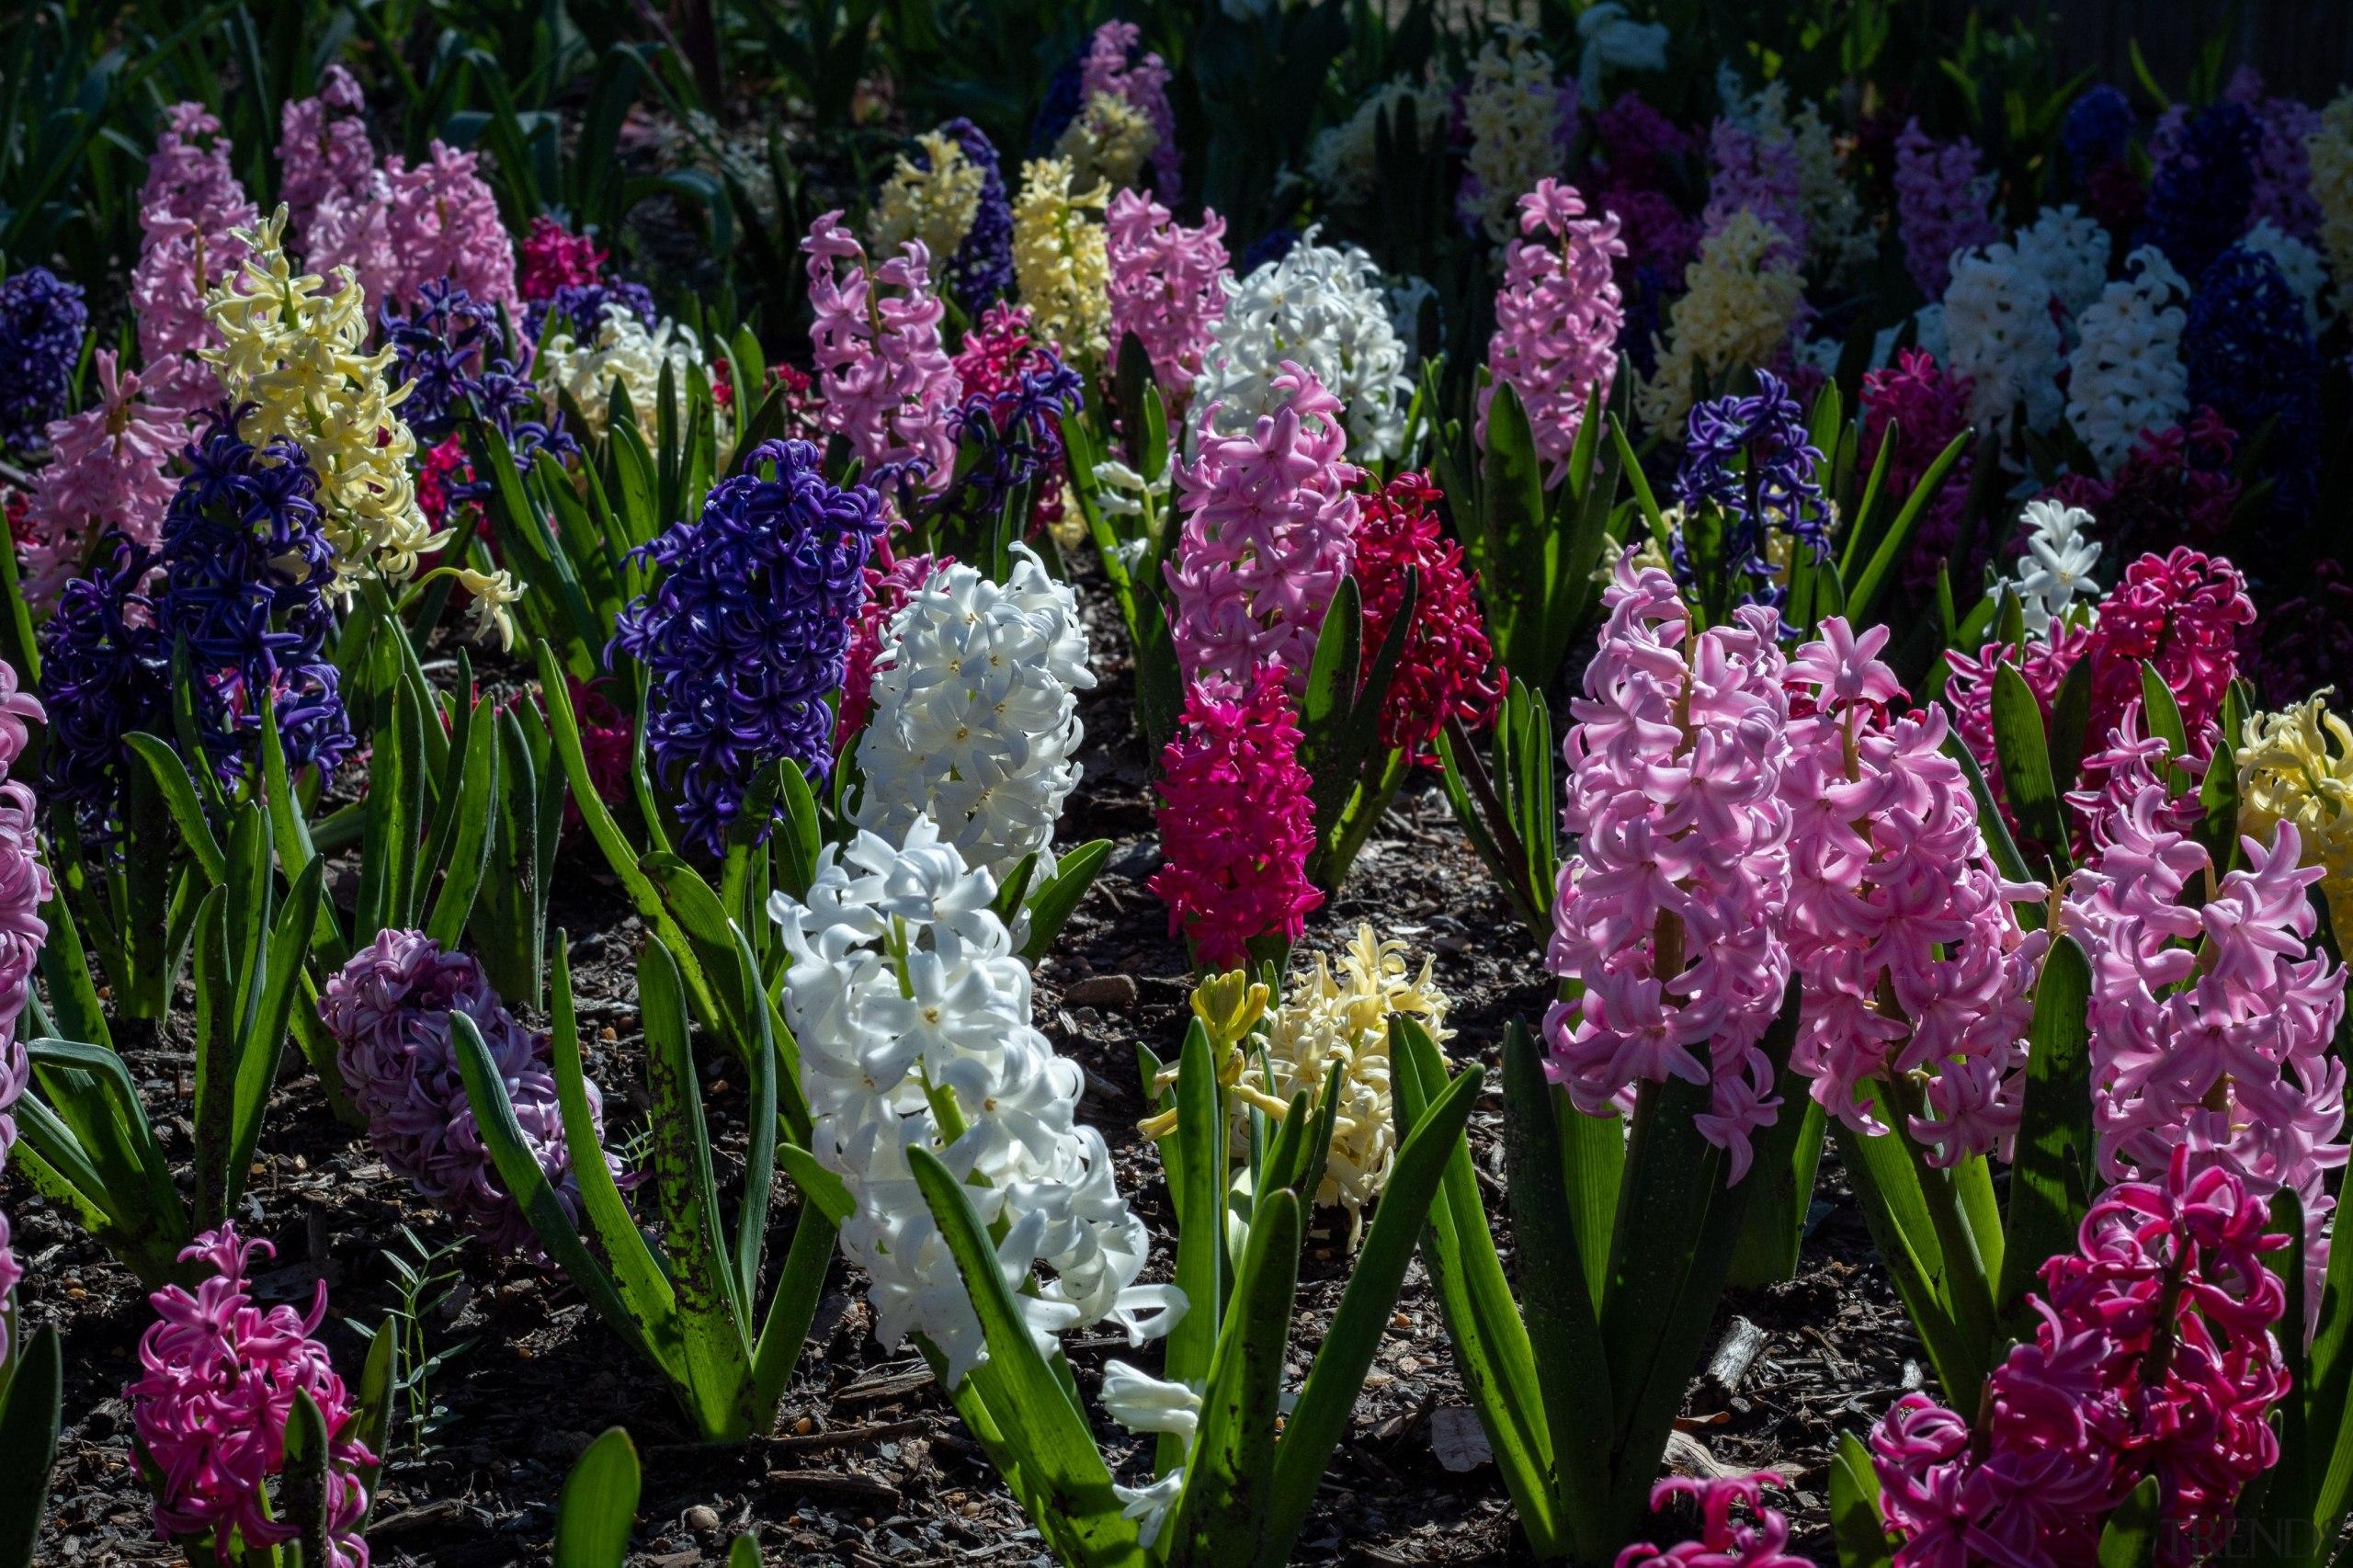 Hyacinth bulbs love being a sunny, well drained